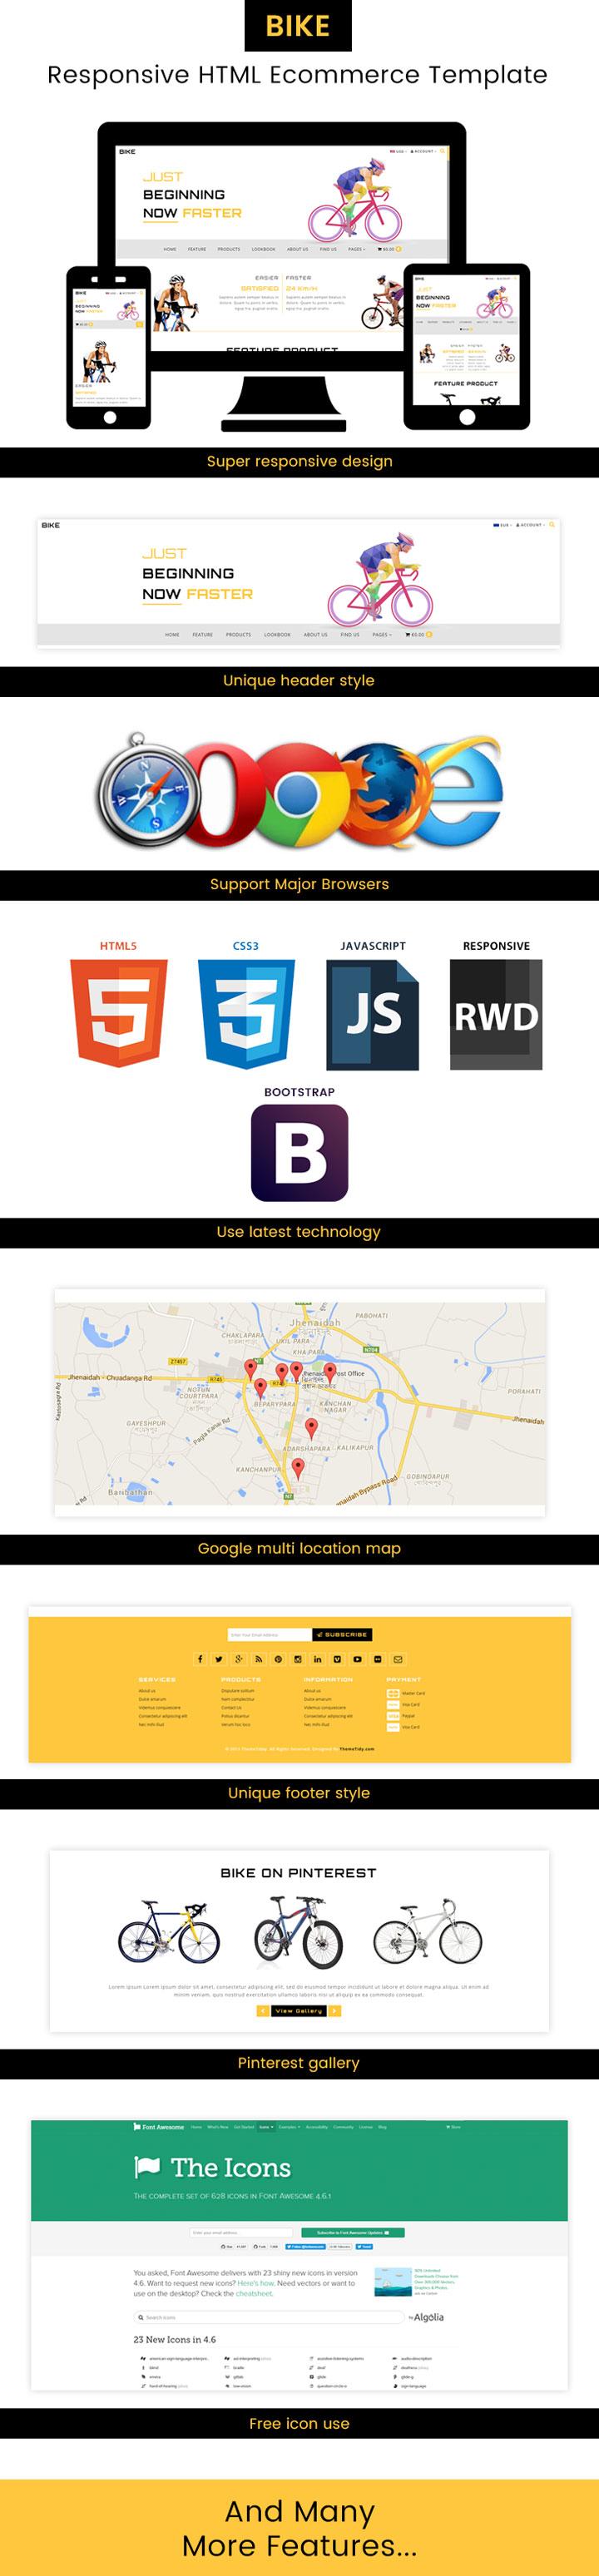 themetidy-Bike-Premium-Responsive-HTML-Ecommerce-Template-wordpress-feature-list-image